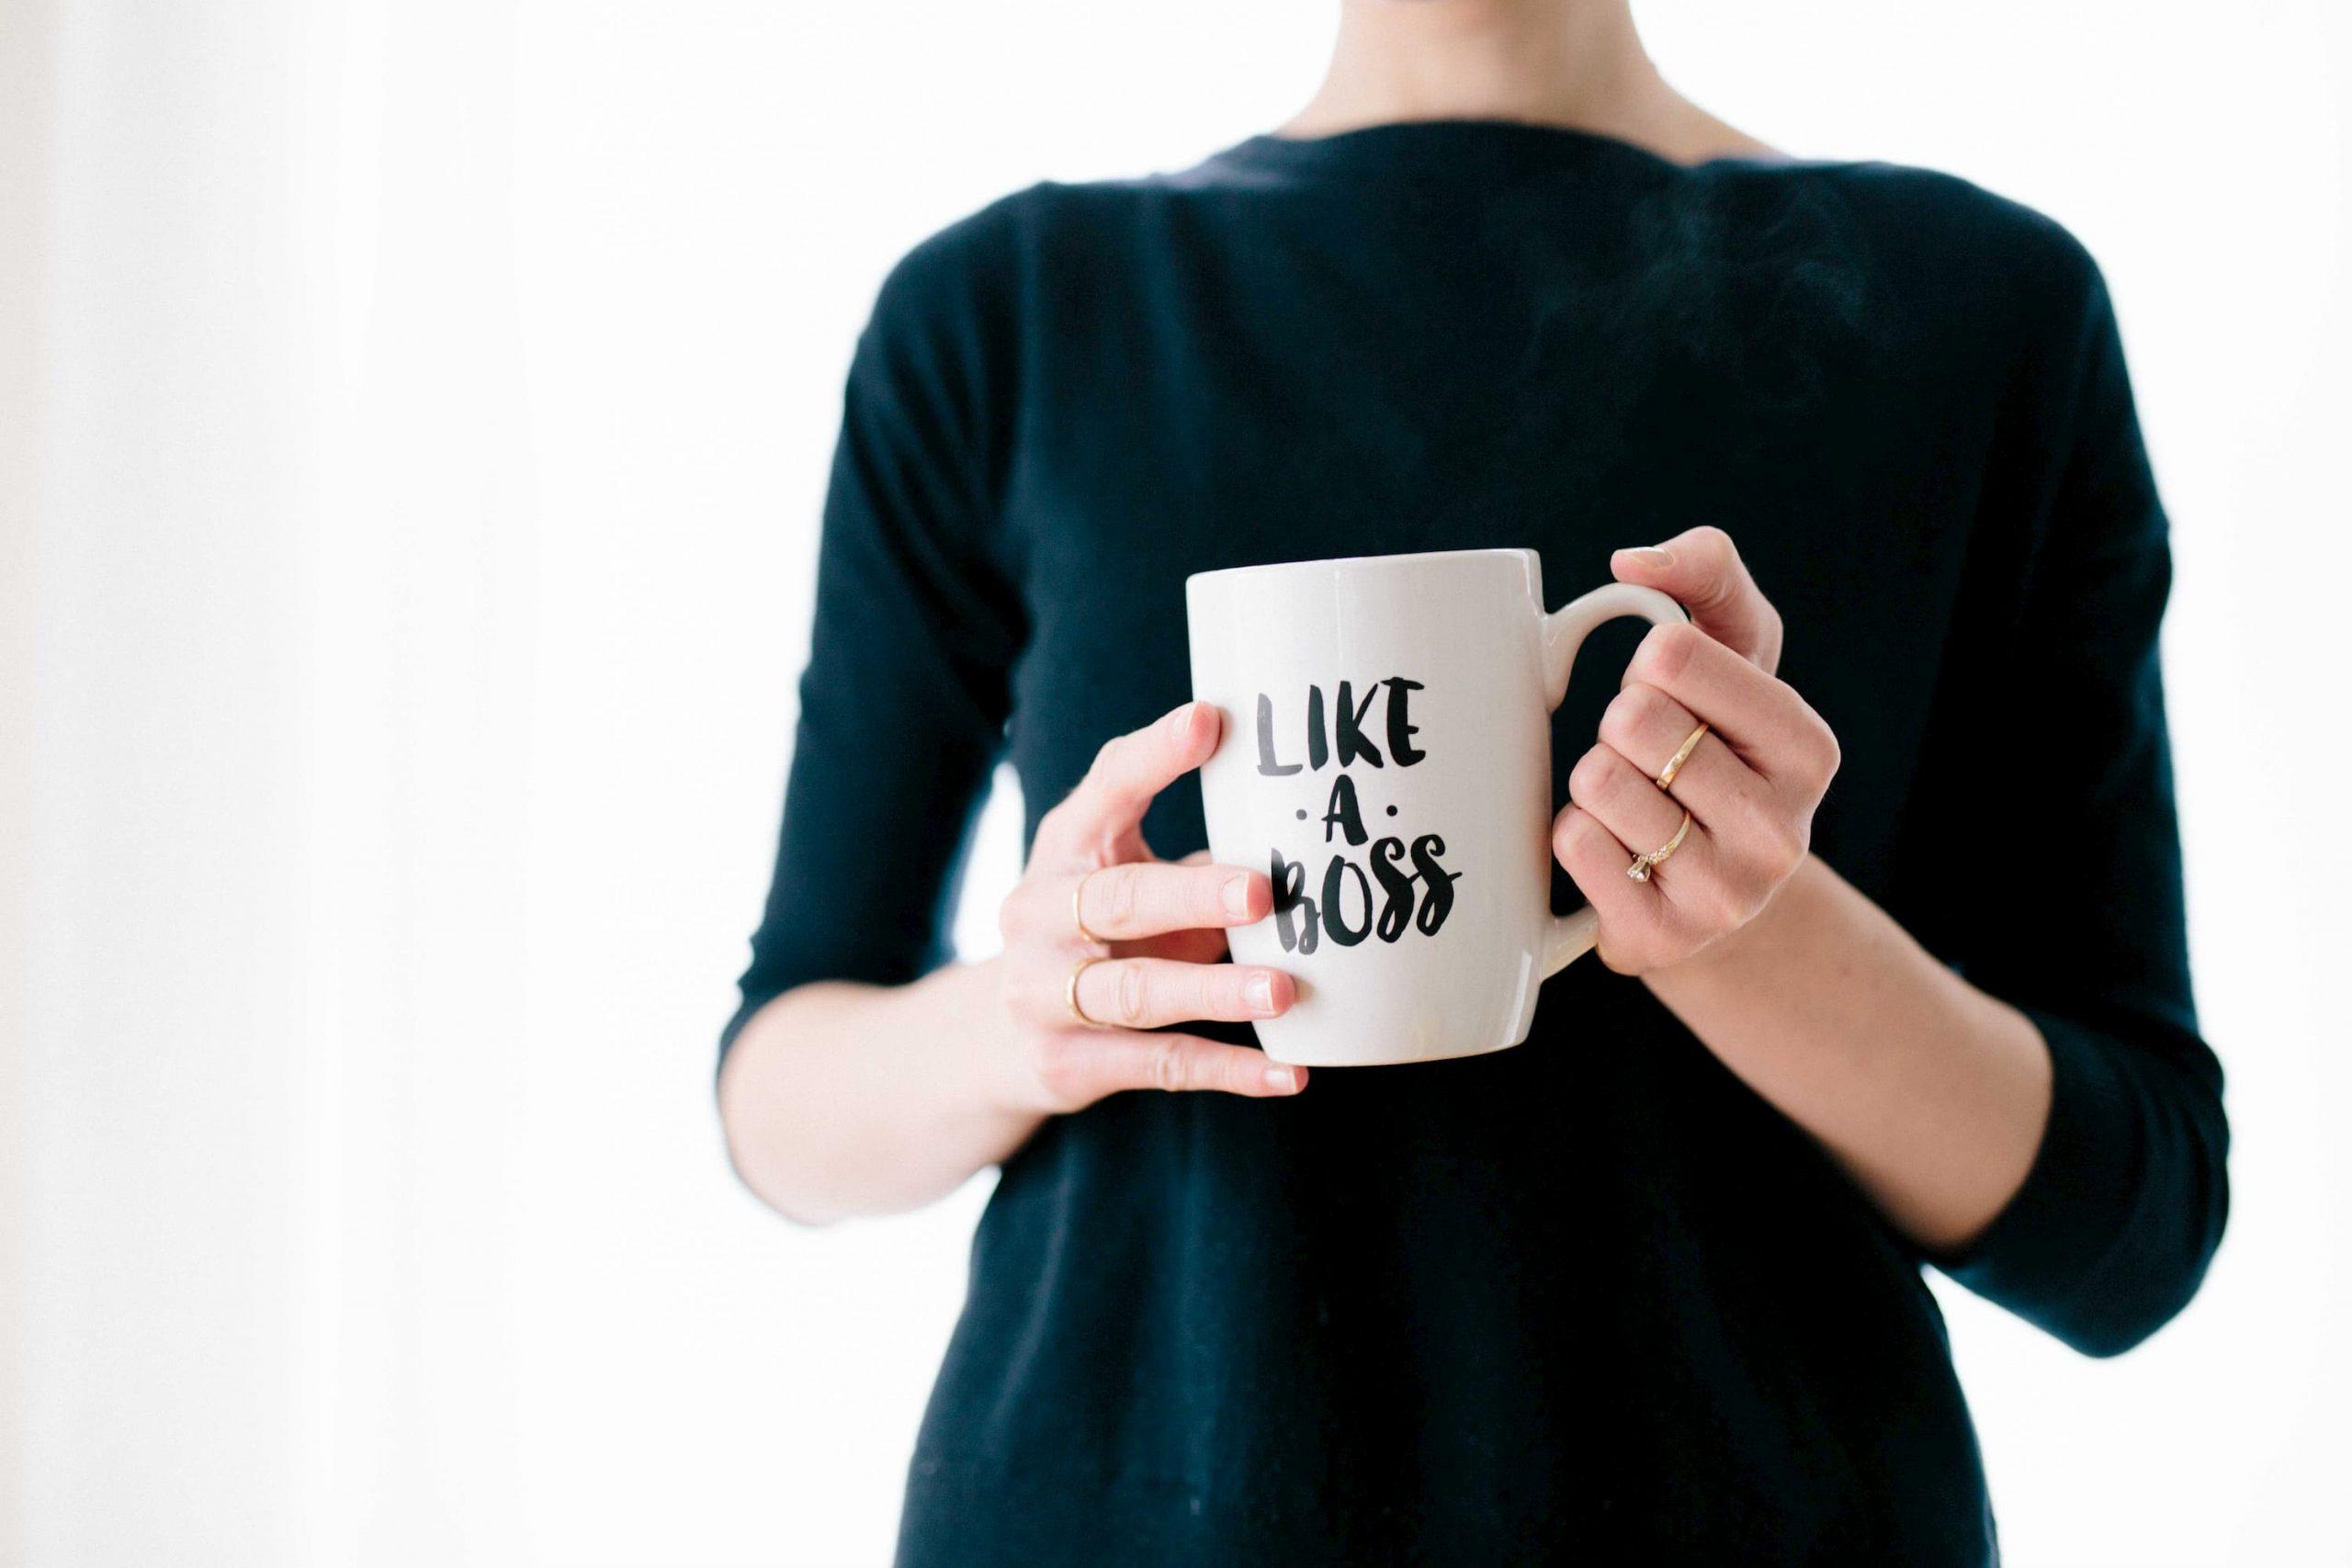 Woman manager holding boss-themed mug